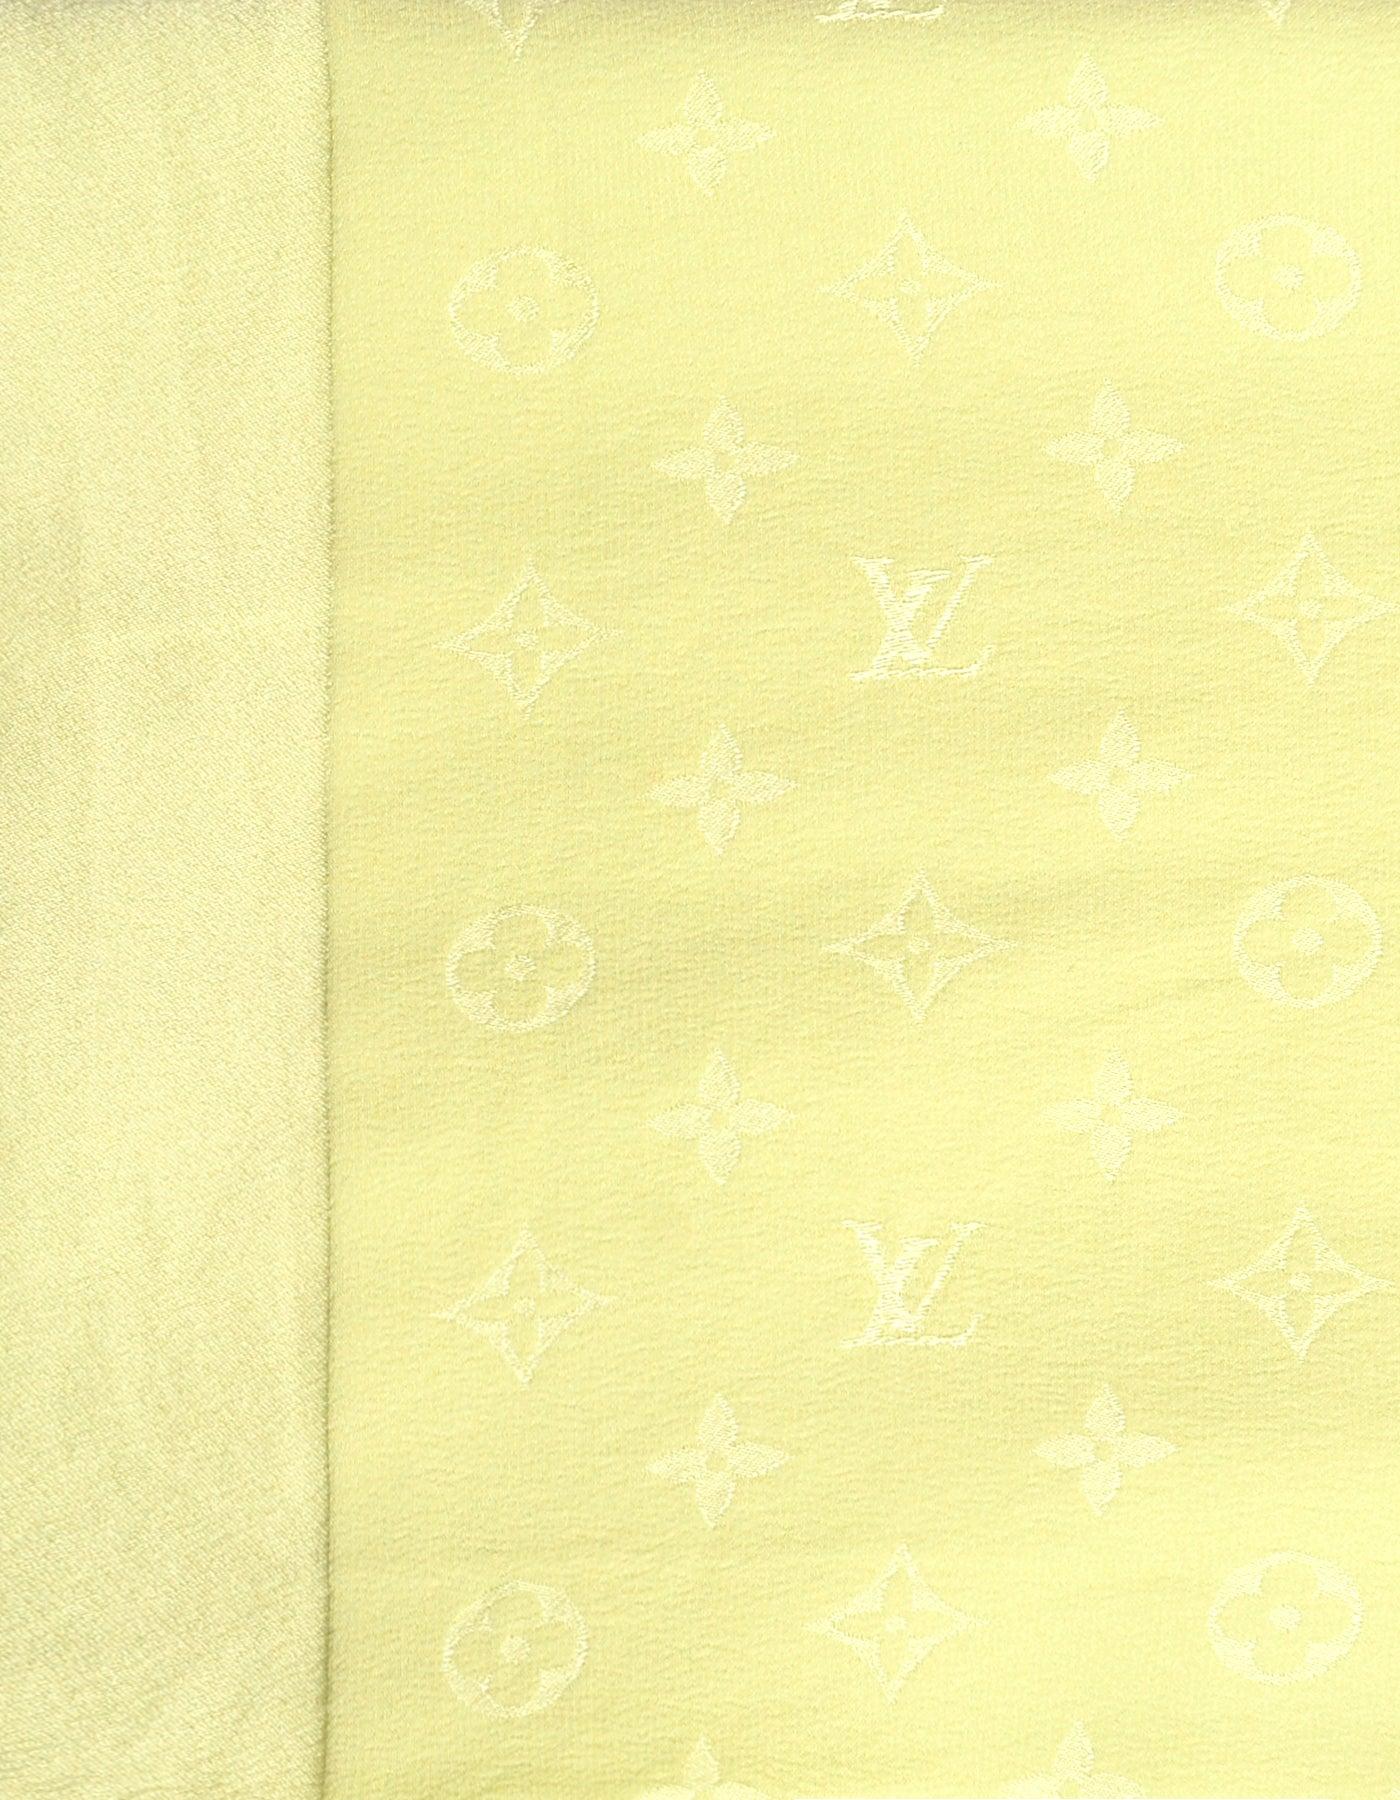 Louis Vuitton Light Green Lv Monogram Silk Scarf For Sale At 1stdibs